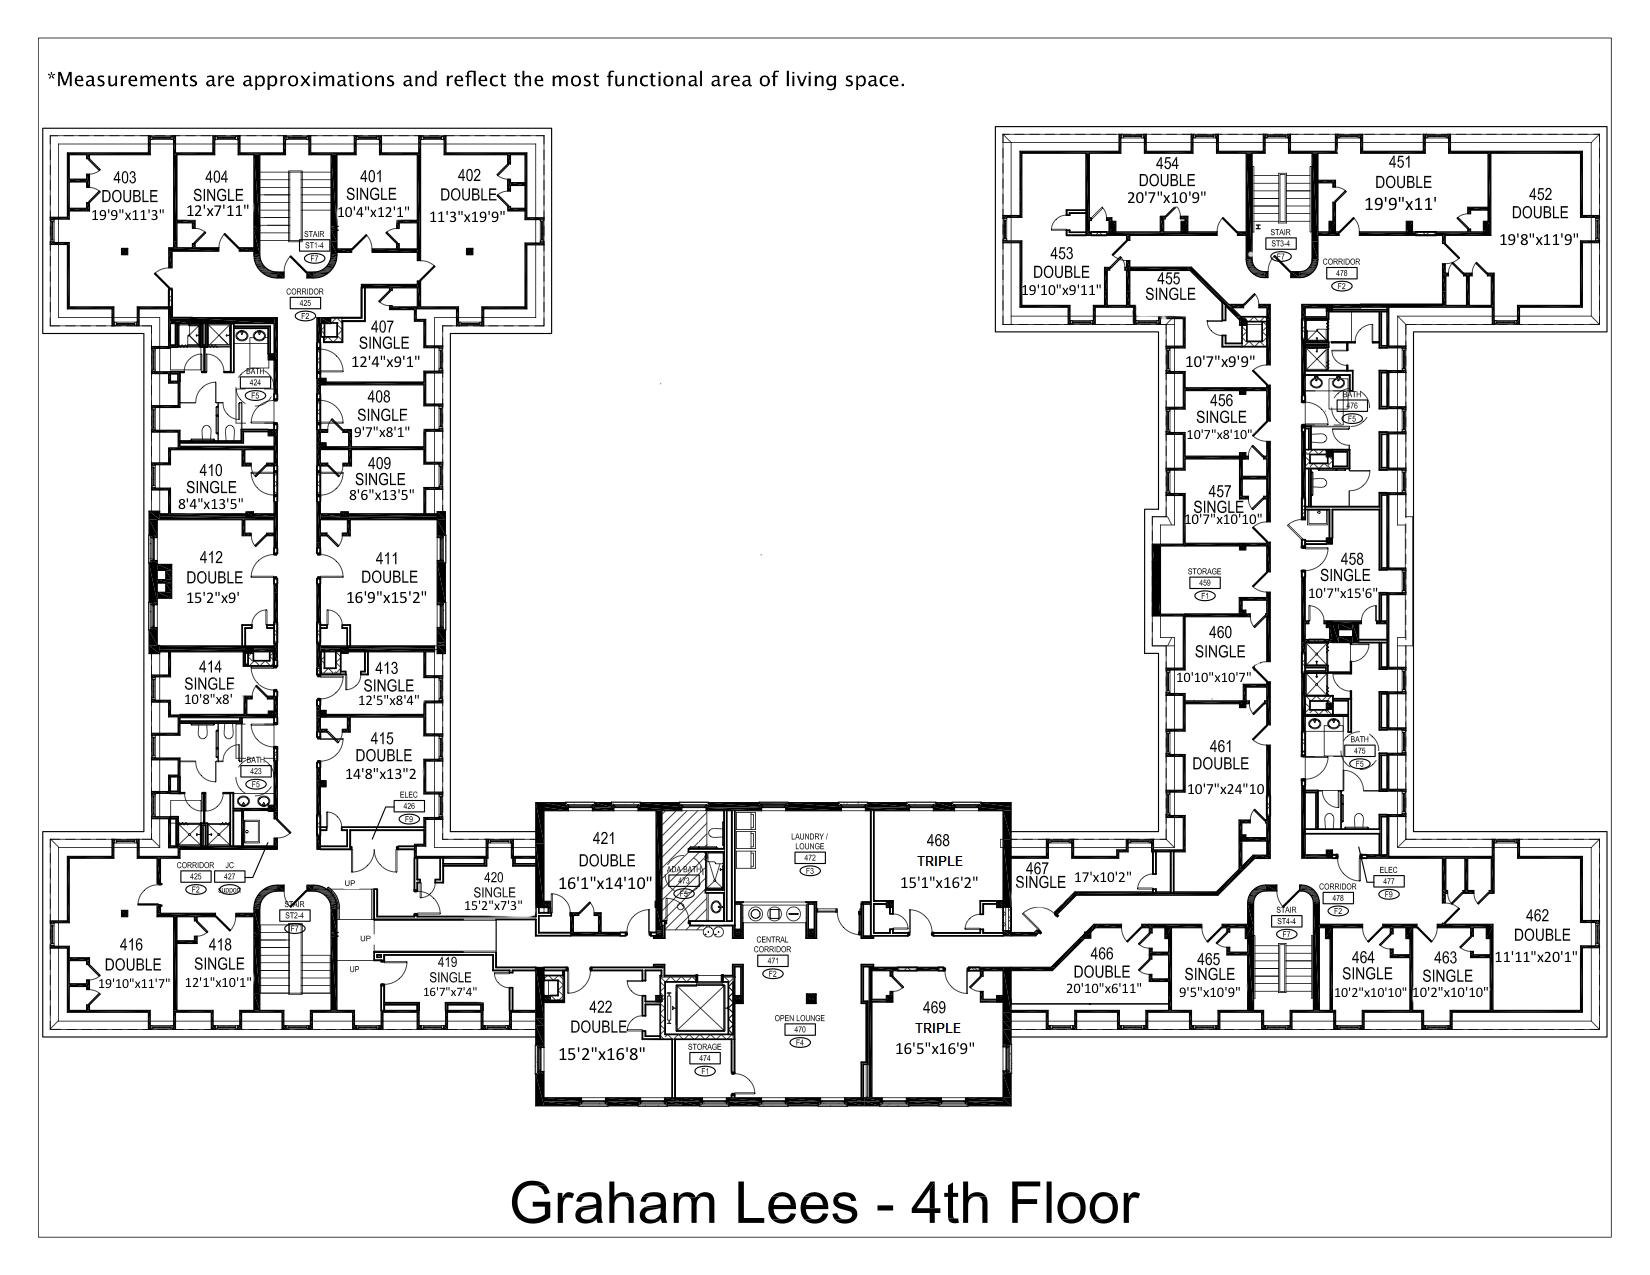 Graham Lees Hall Washington And Lee University